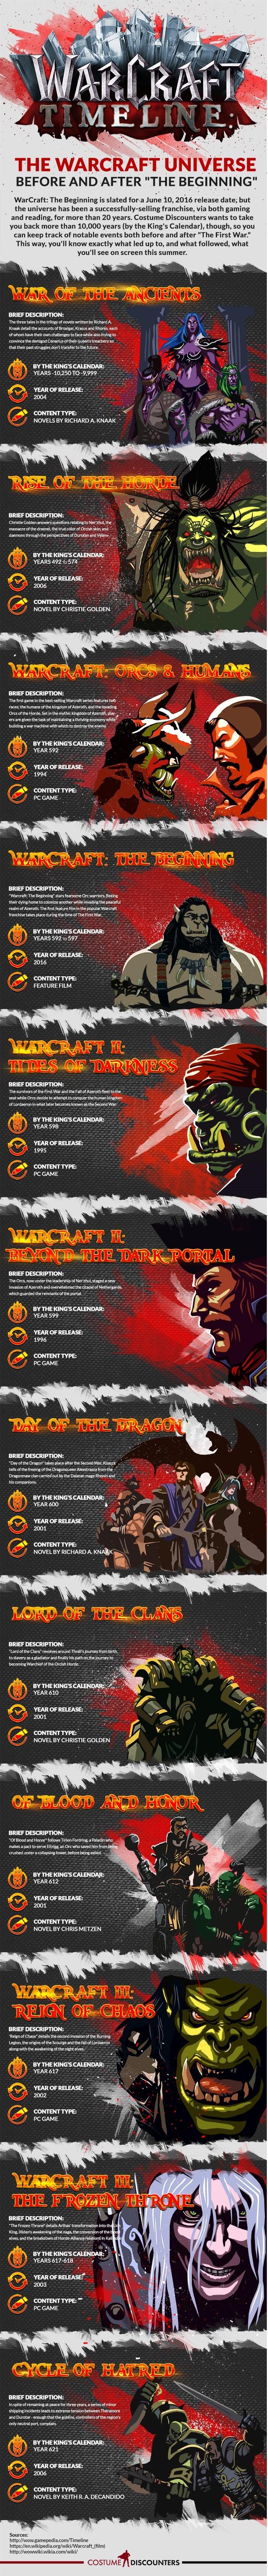 WarCraft-Timeline-Infographic-4